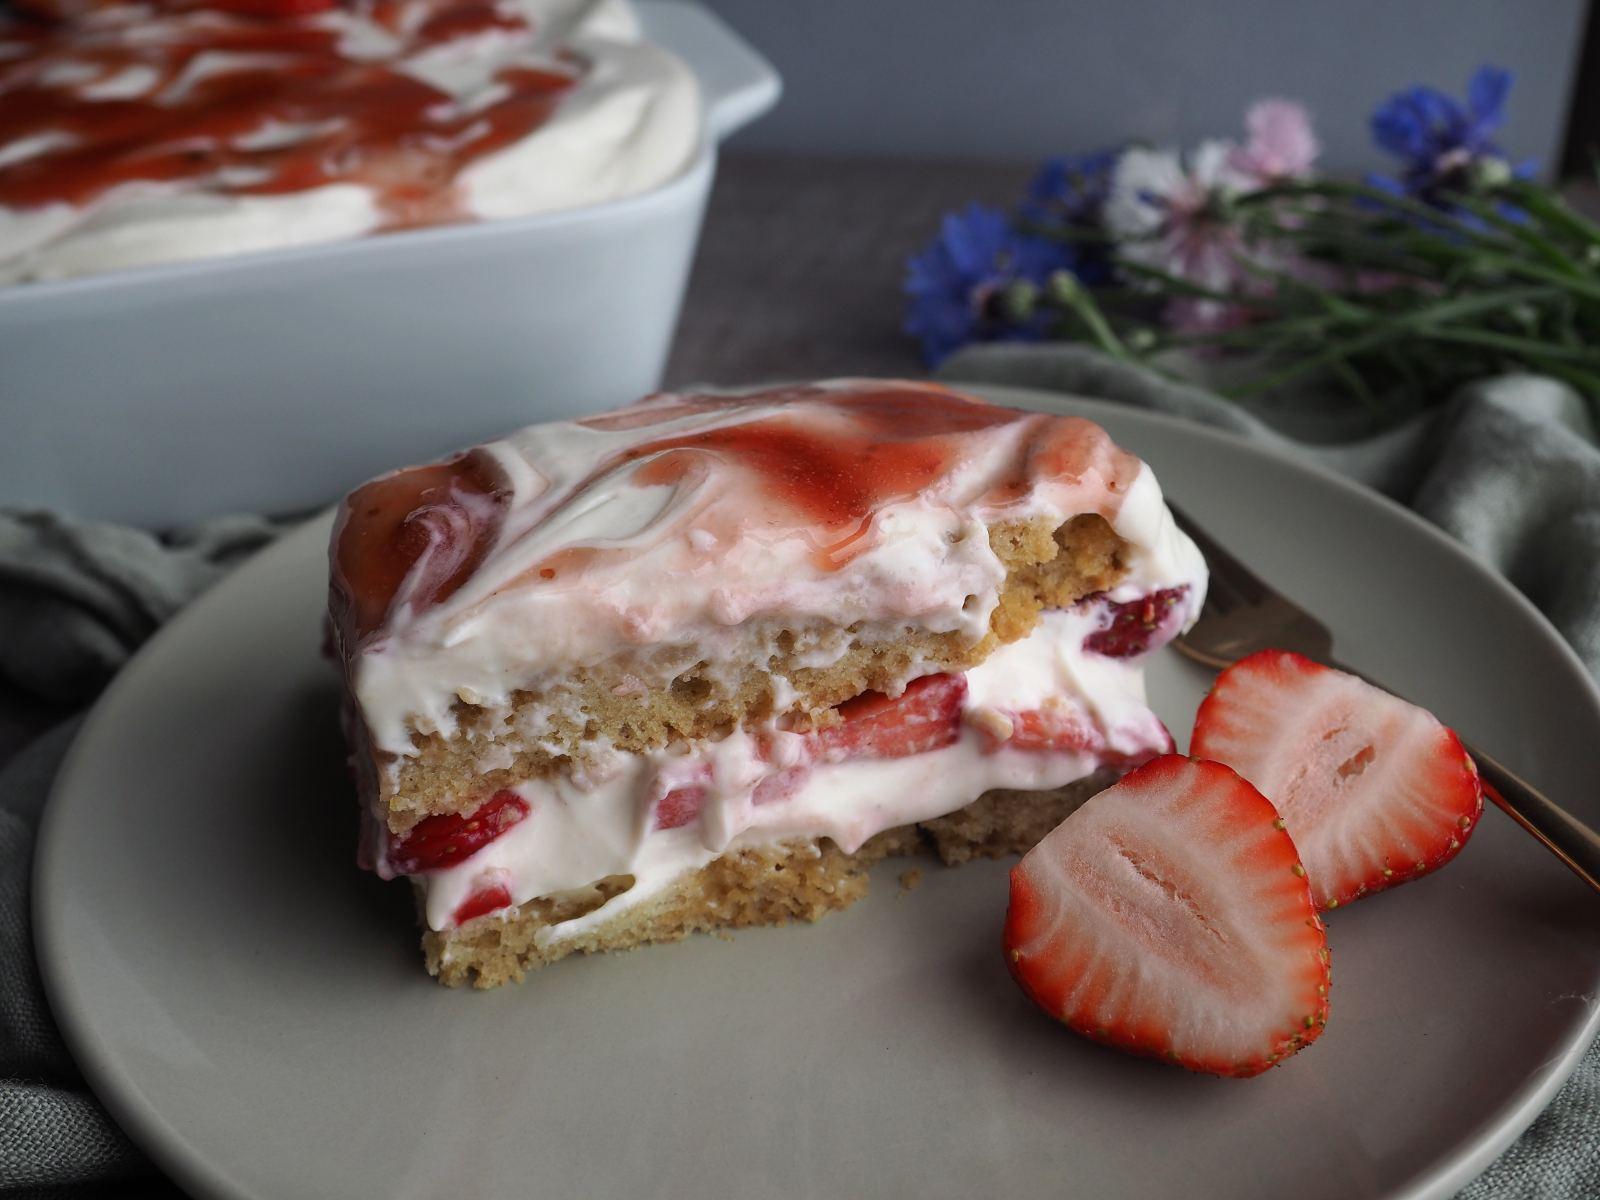 Veganes Erdbeer-Tiramisu ohne Löffelbiskuits Anschnitt